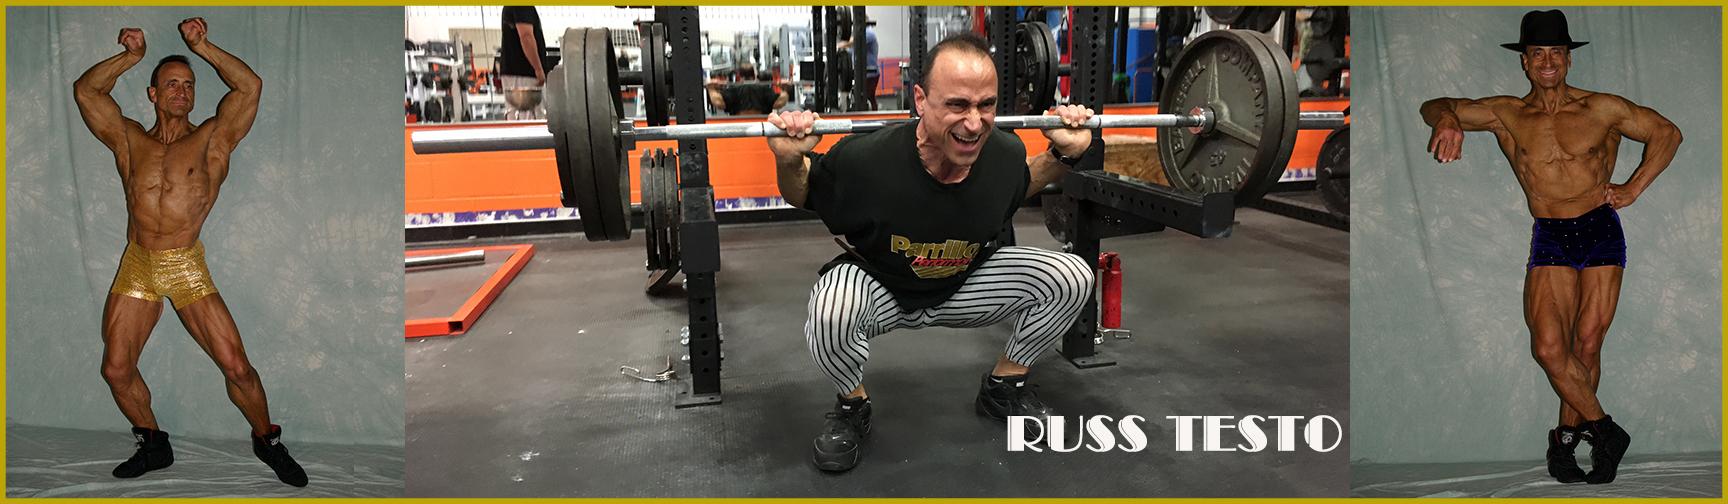 russ-testo-banner